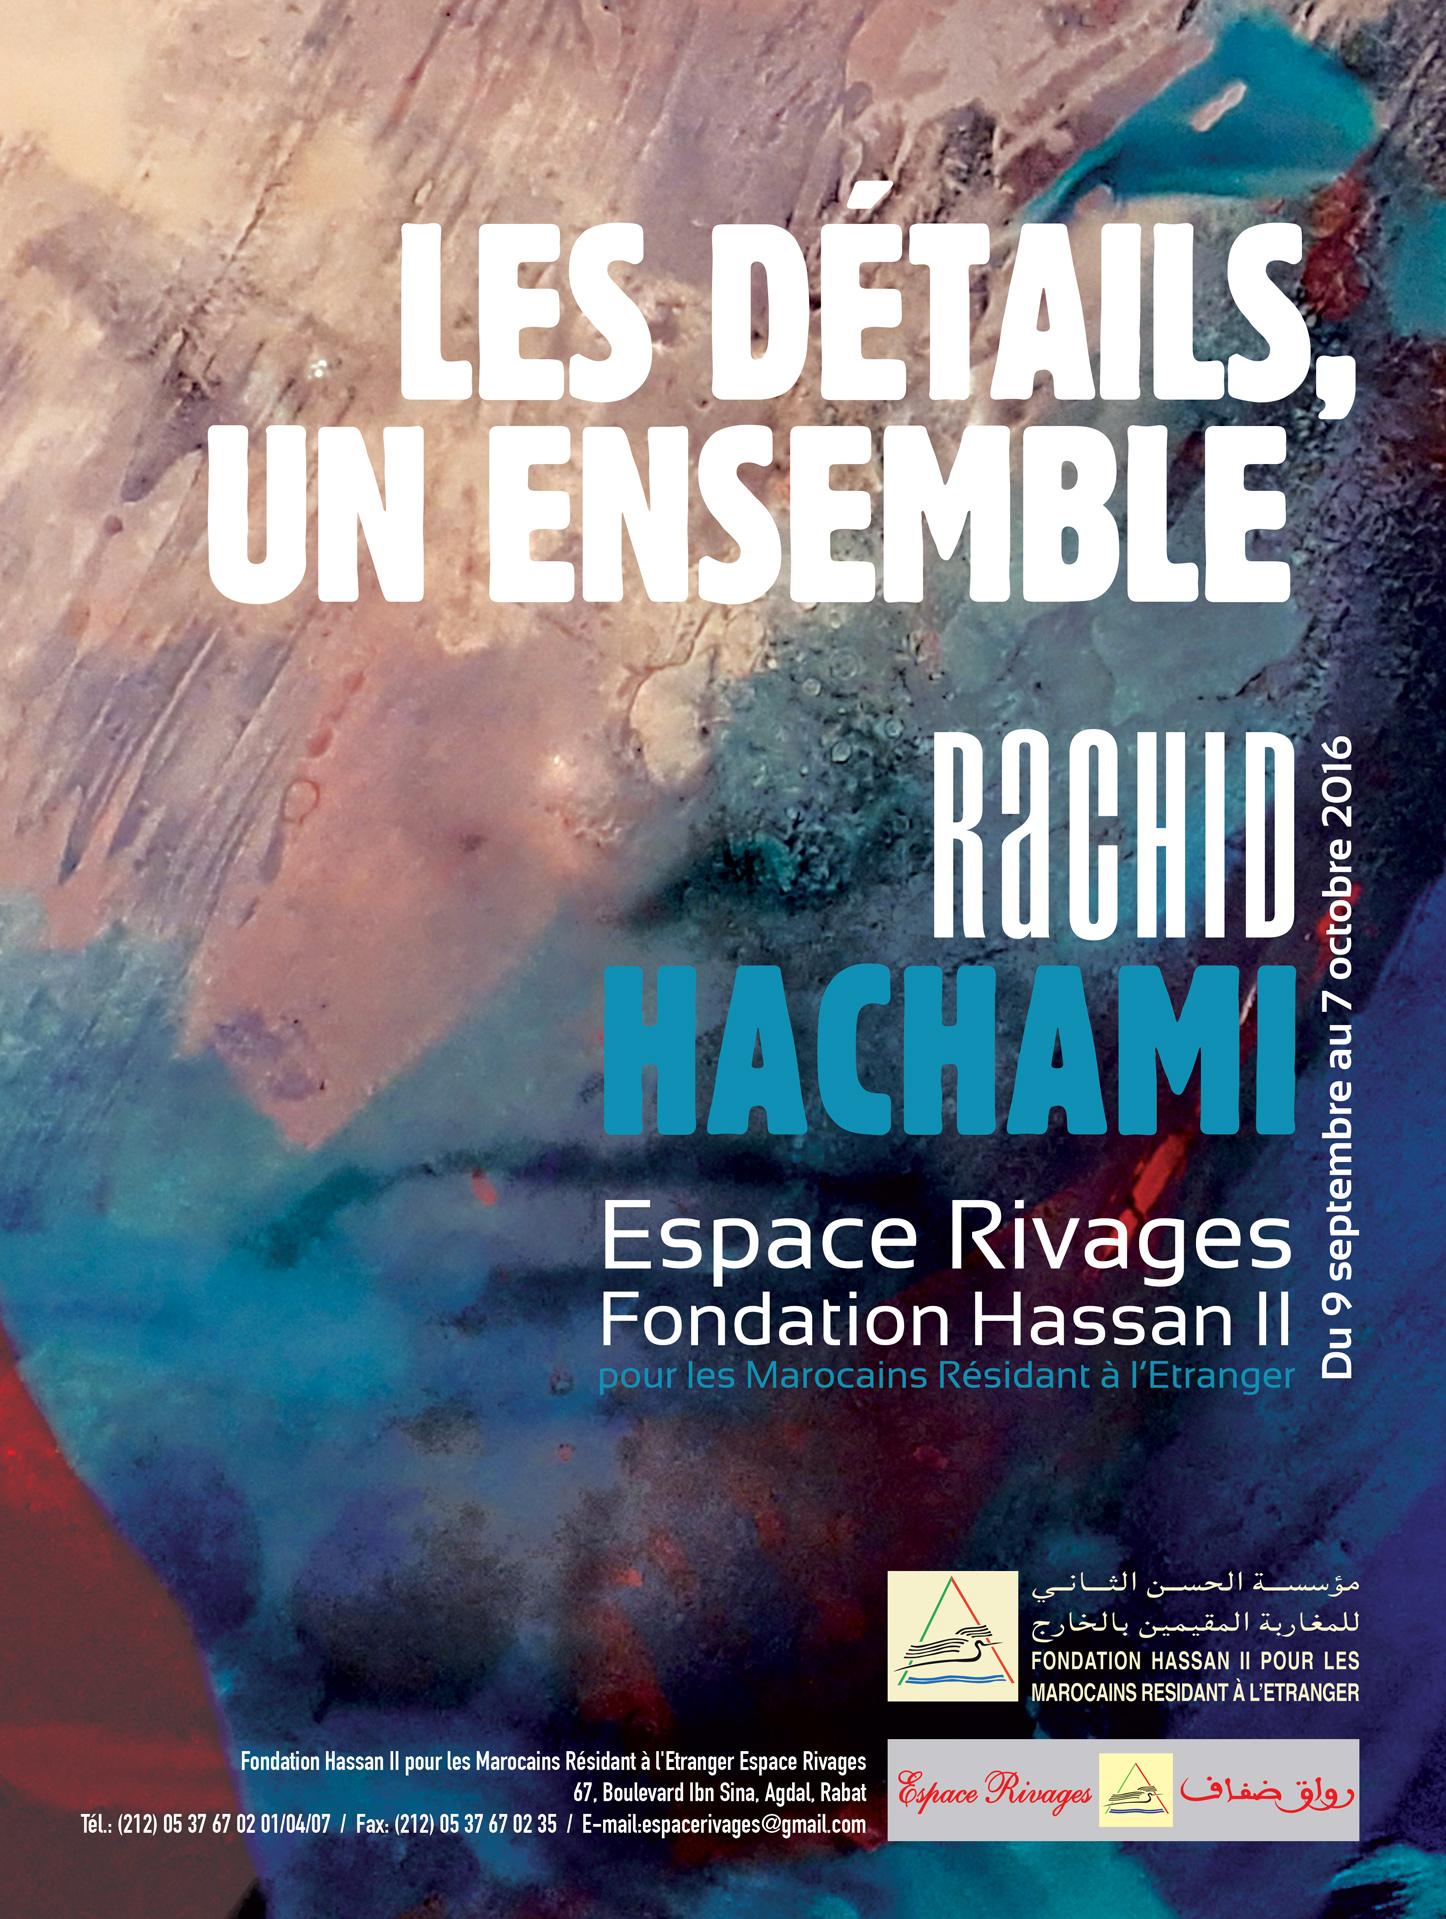 Rachid hachami plasticien hispano marocain un ensemble - Prenom rachid ...